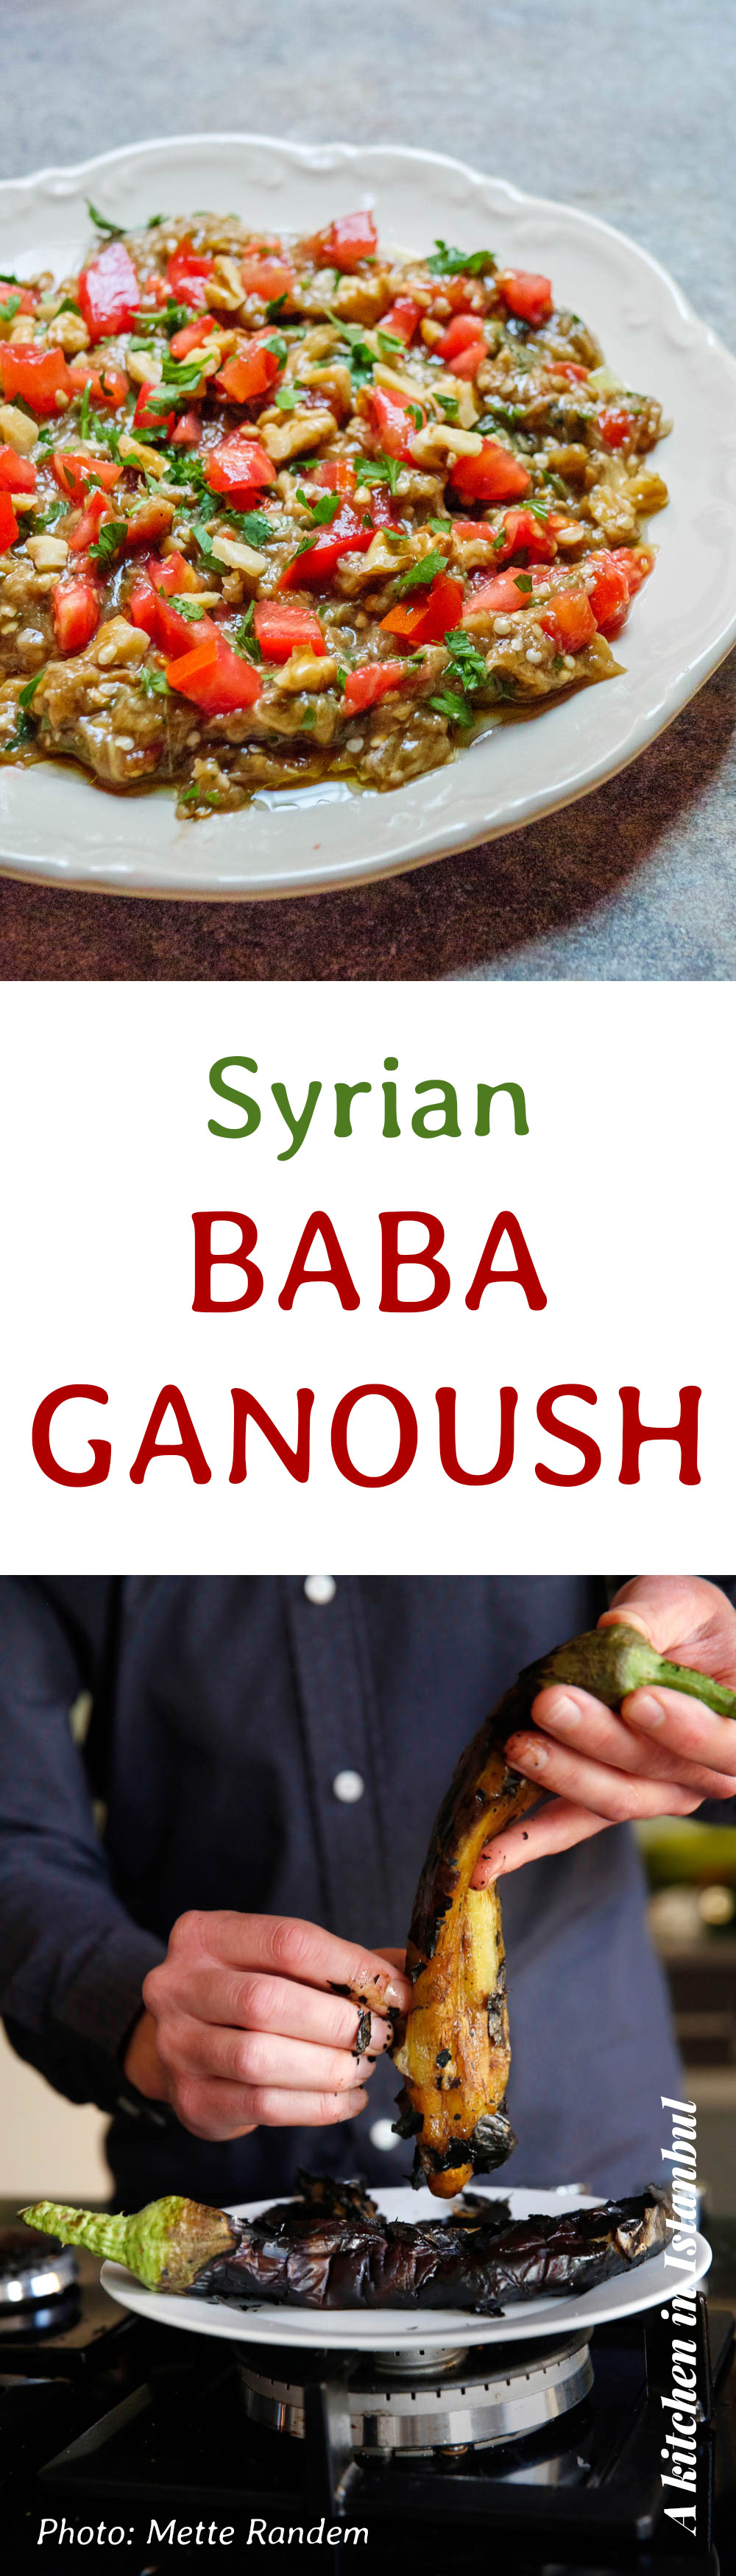 Syrian baba ganoush - recipe / A kitchen in Istanbul